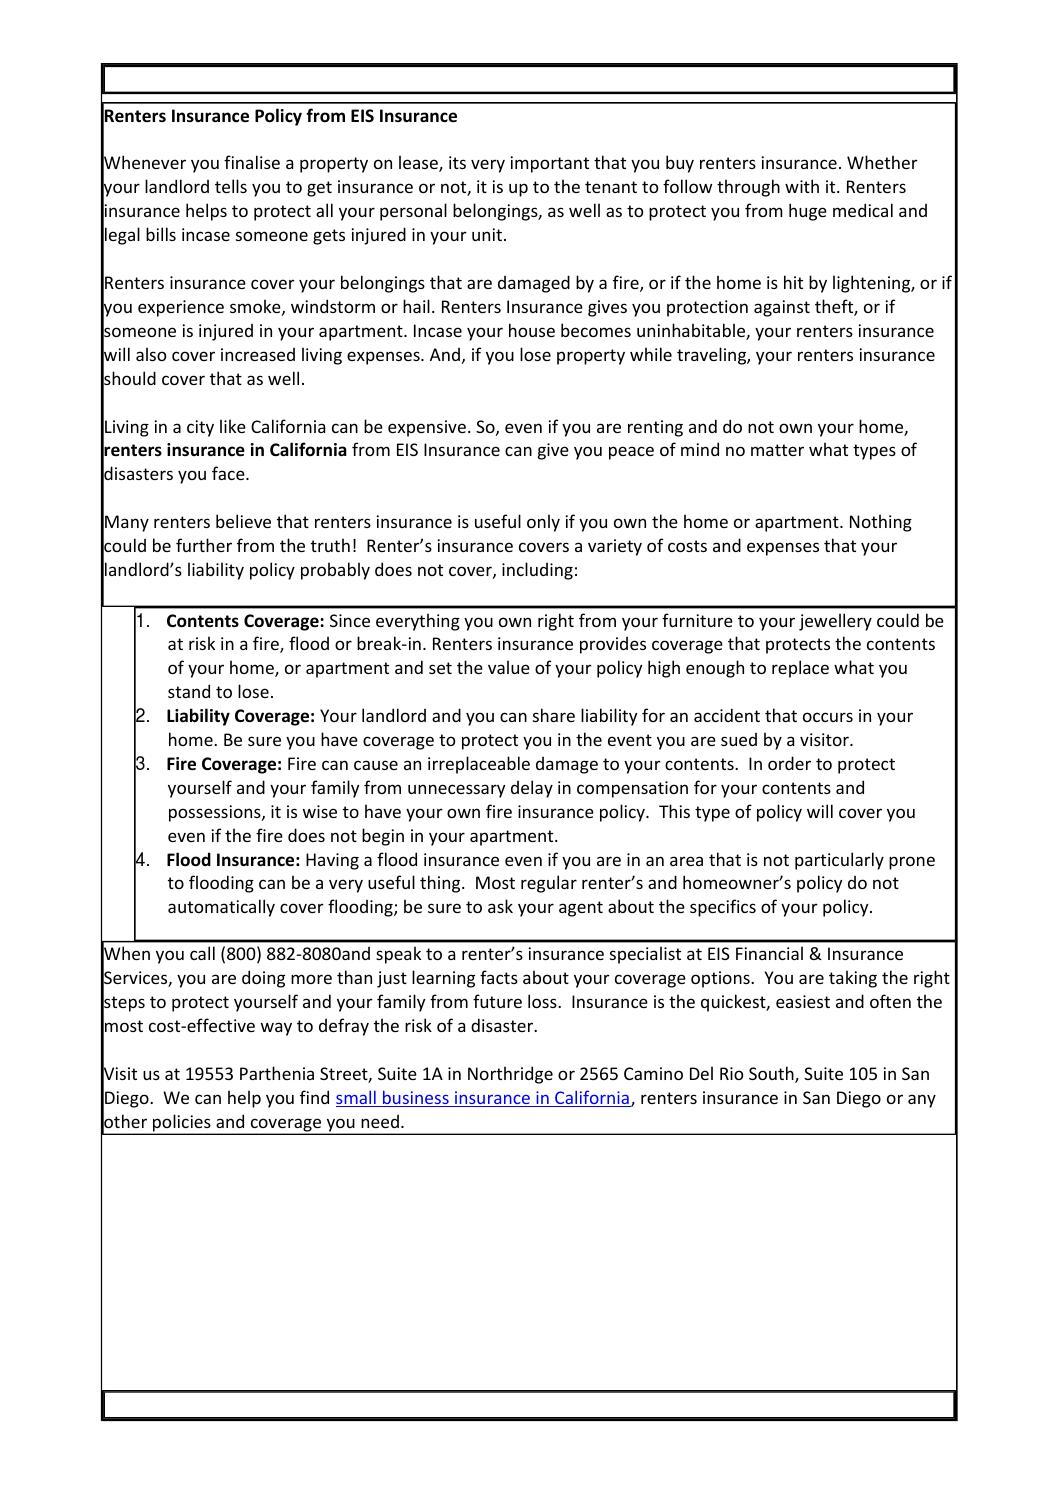 Home Renters Insurance >> Renters Insurance Policy From Eis Insurance By Eis Insurance